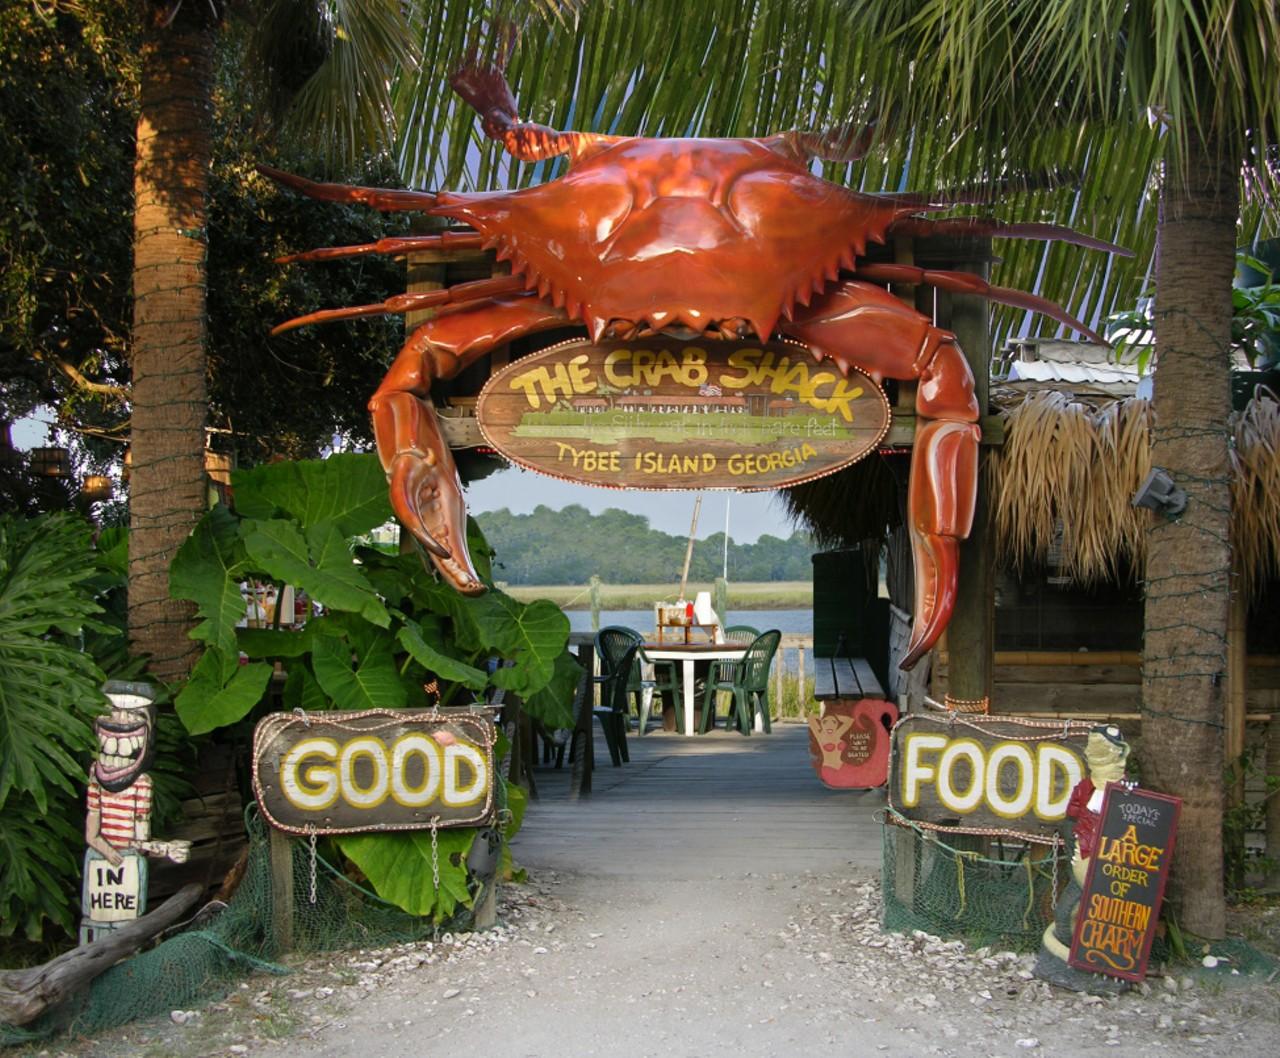 carolina crab house menu